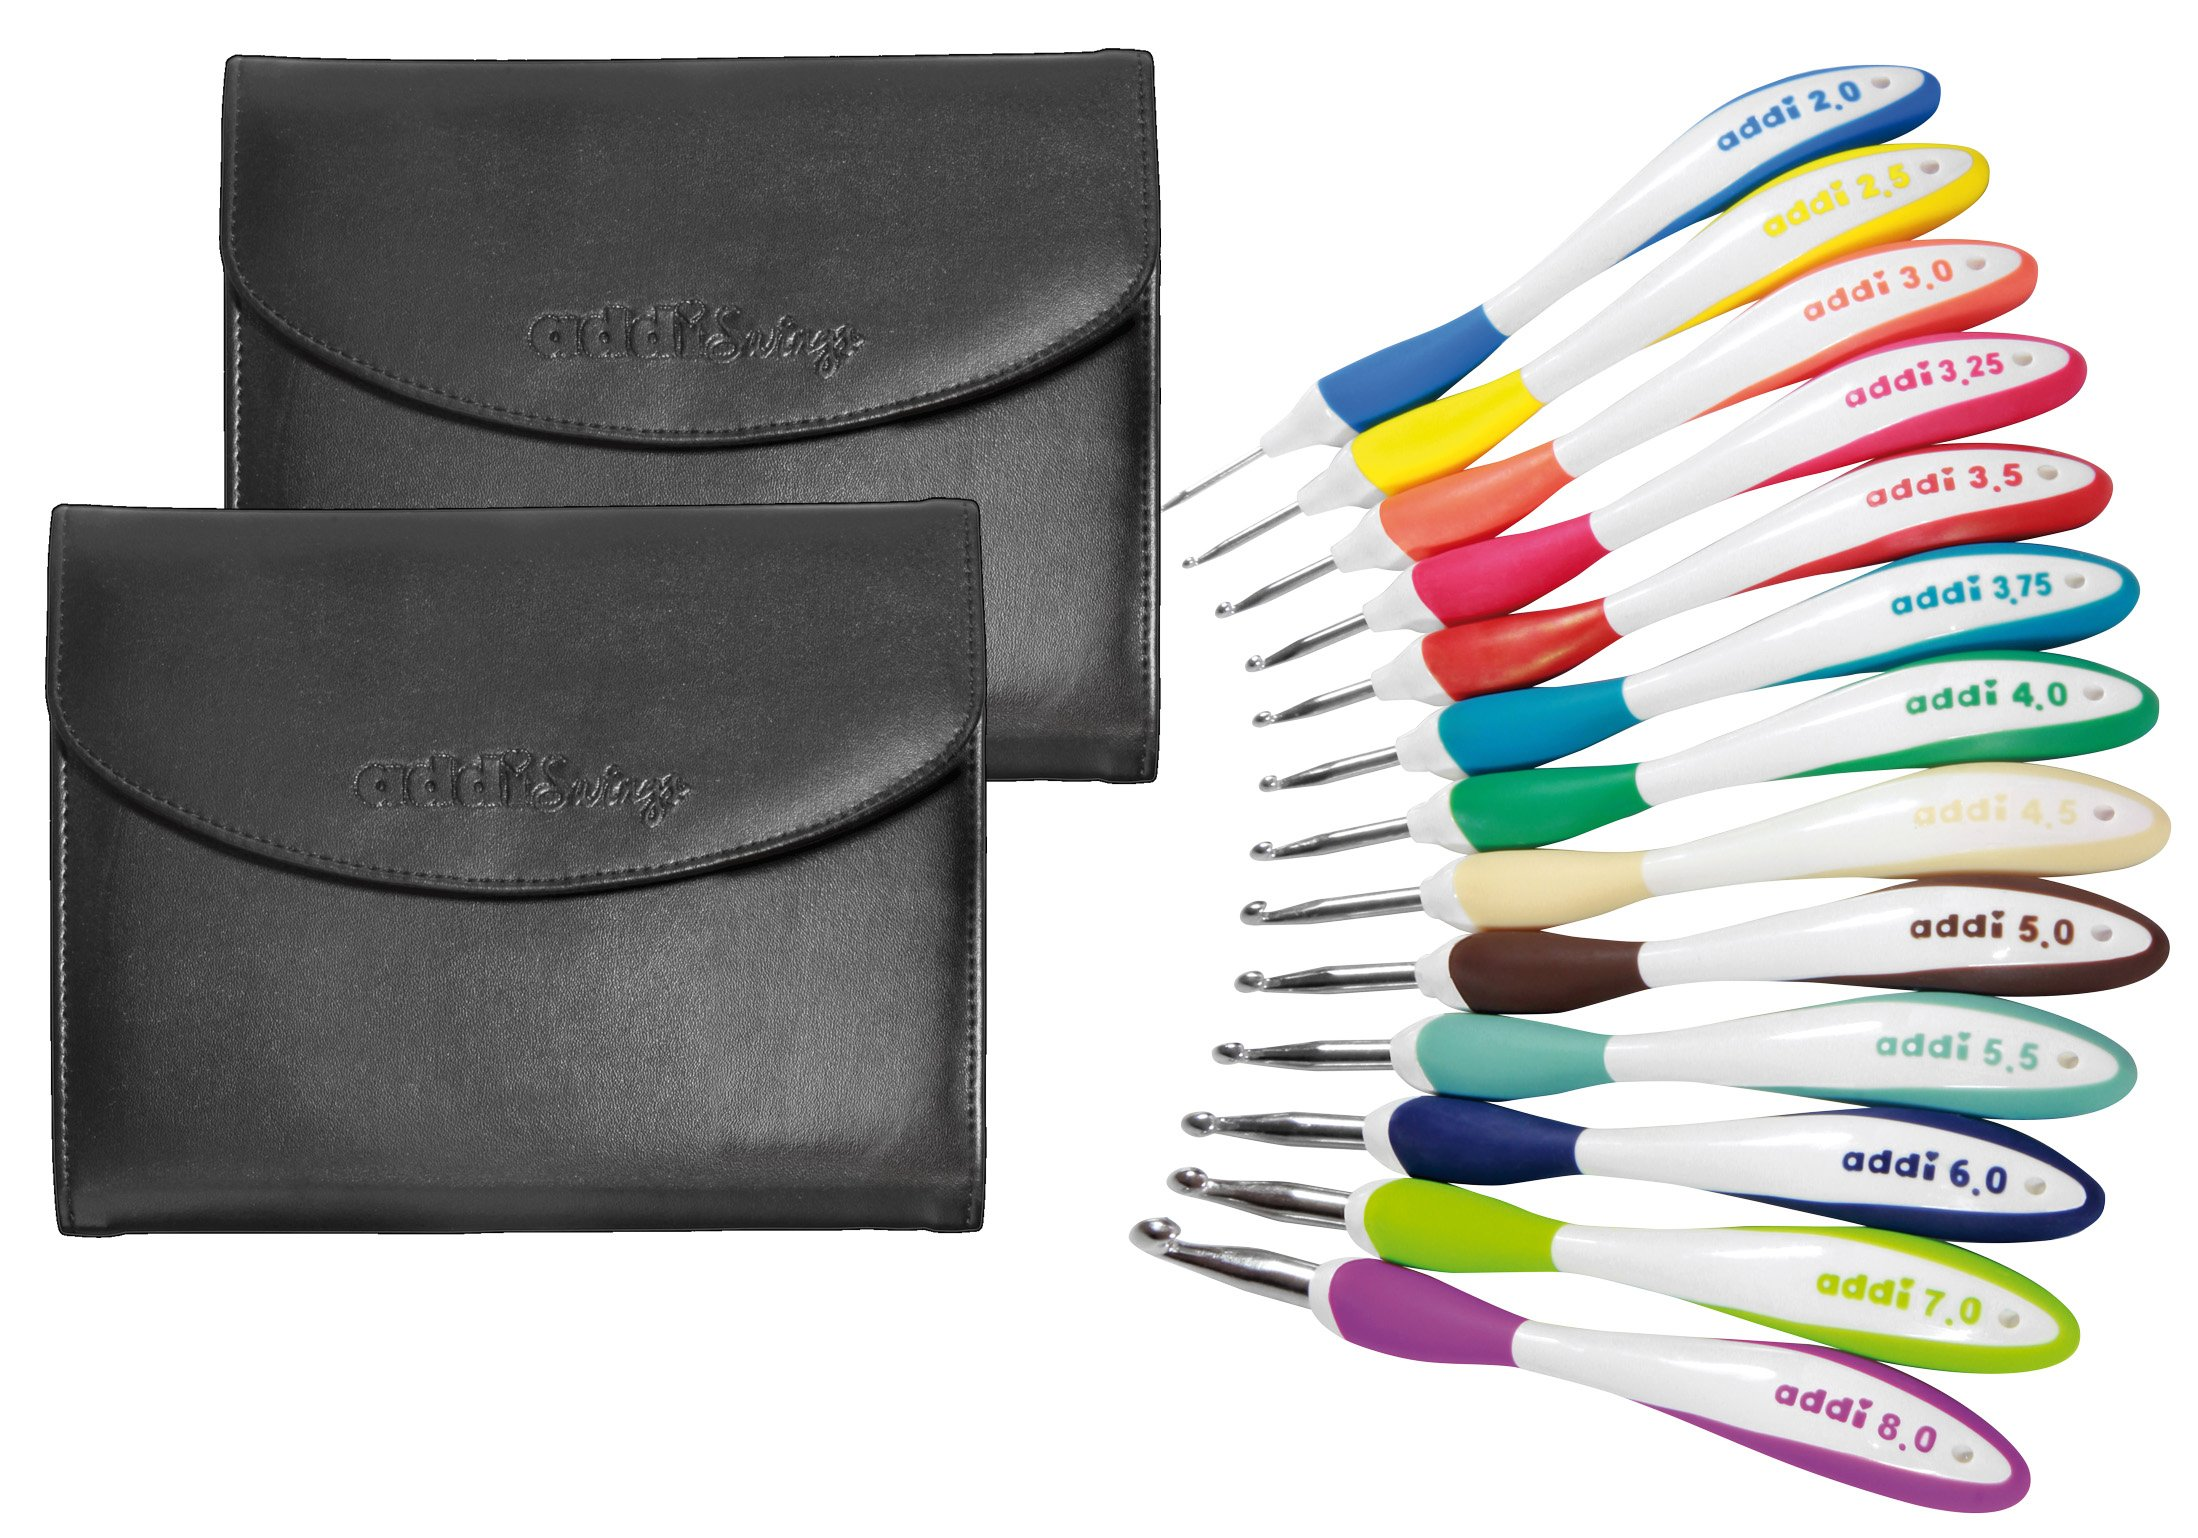 addi Swing Hooks - Set of 13 Hooks In Original addi Leather Cases by addi (Image #1)